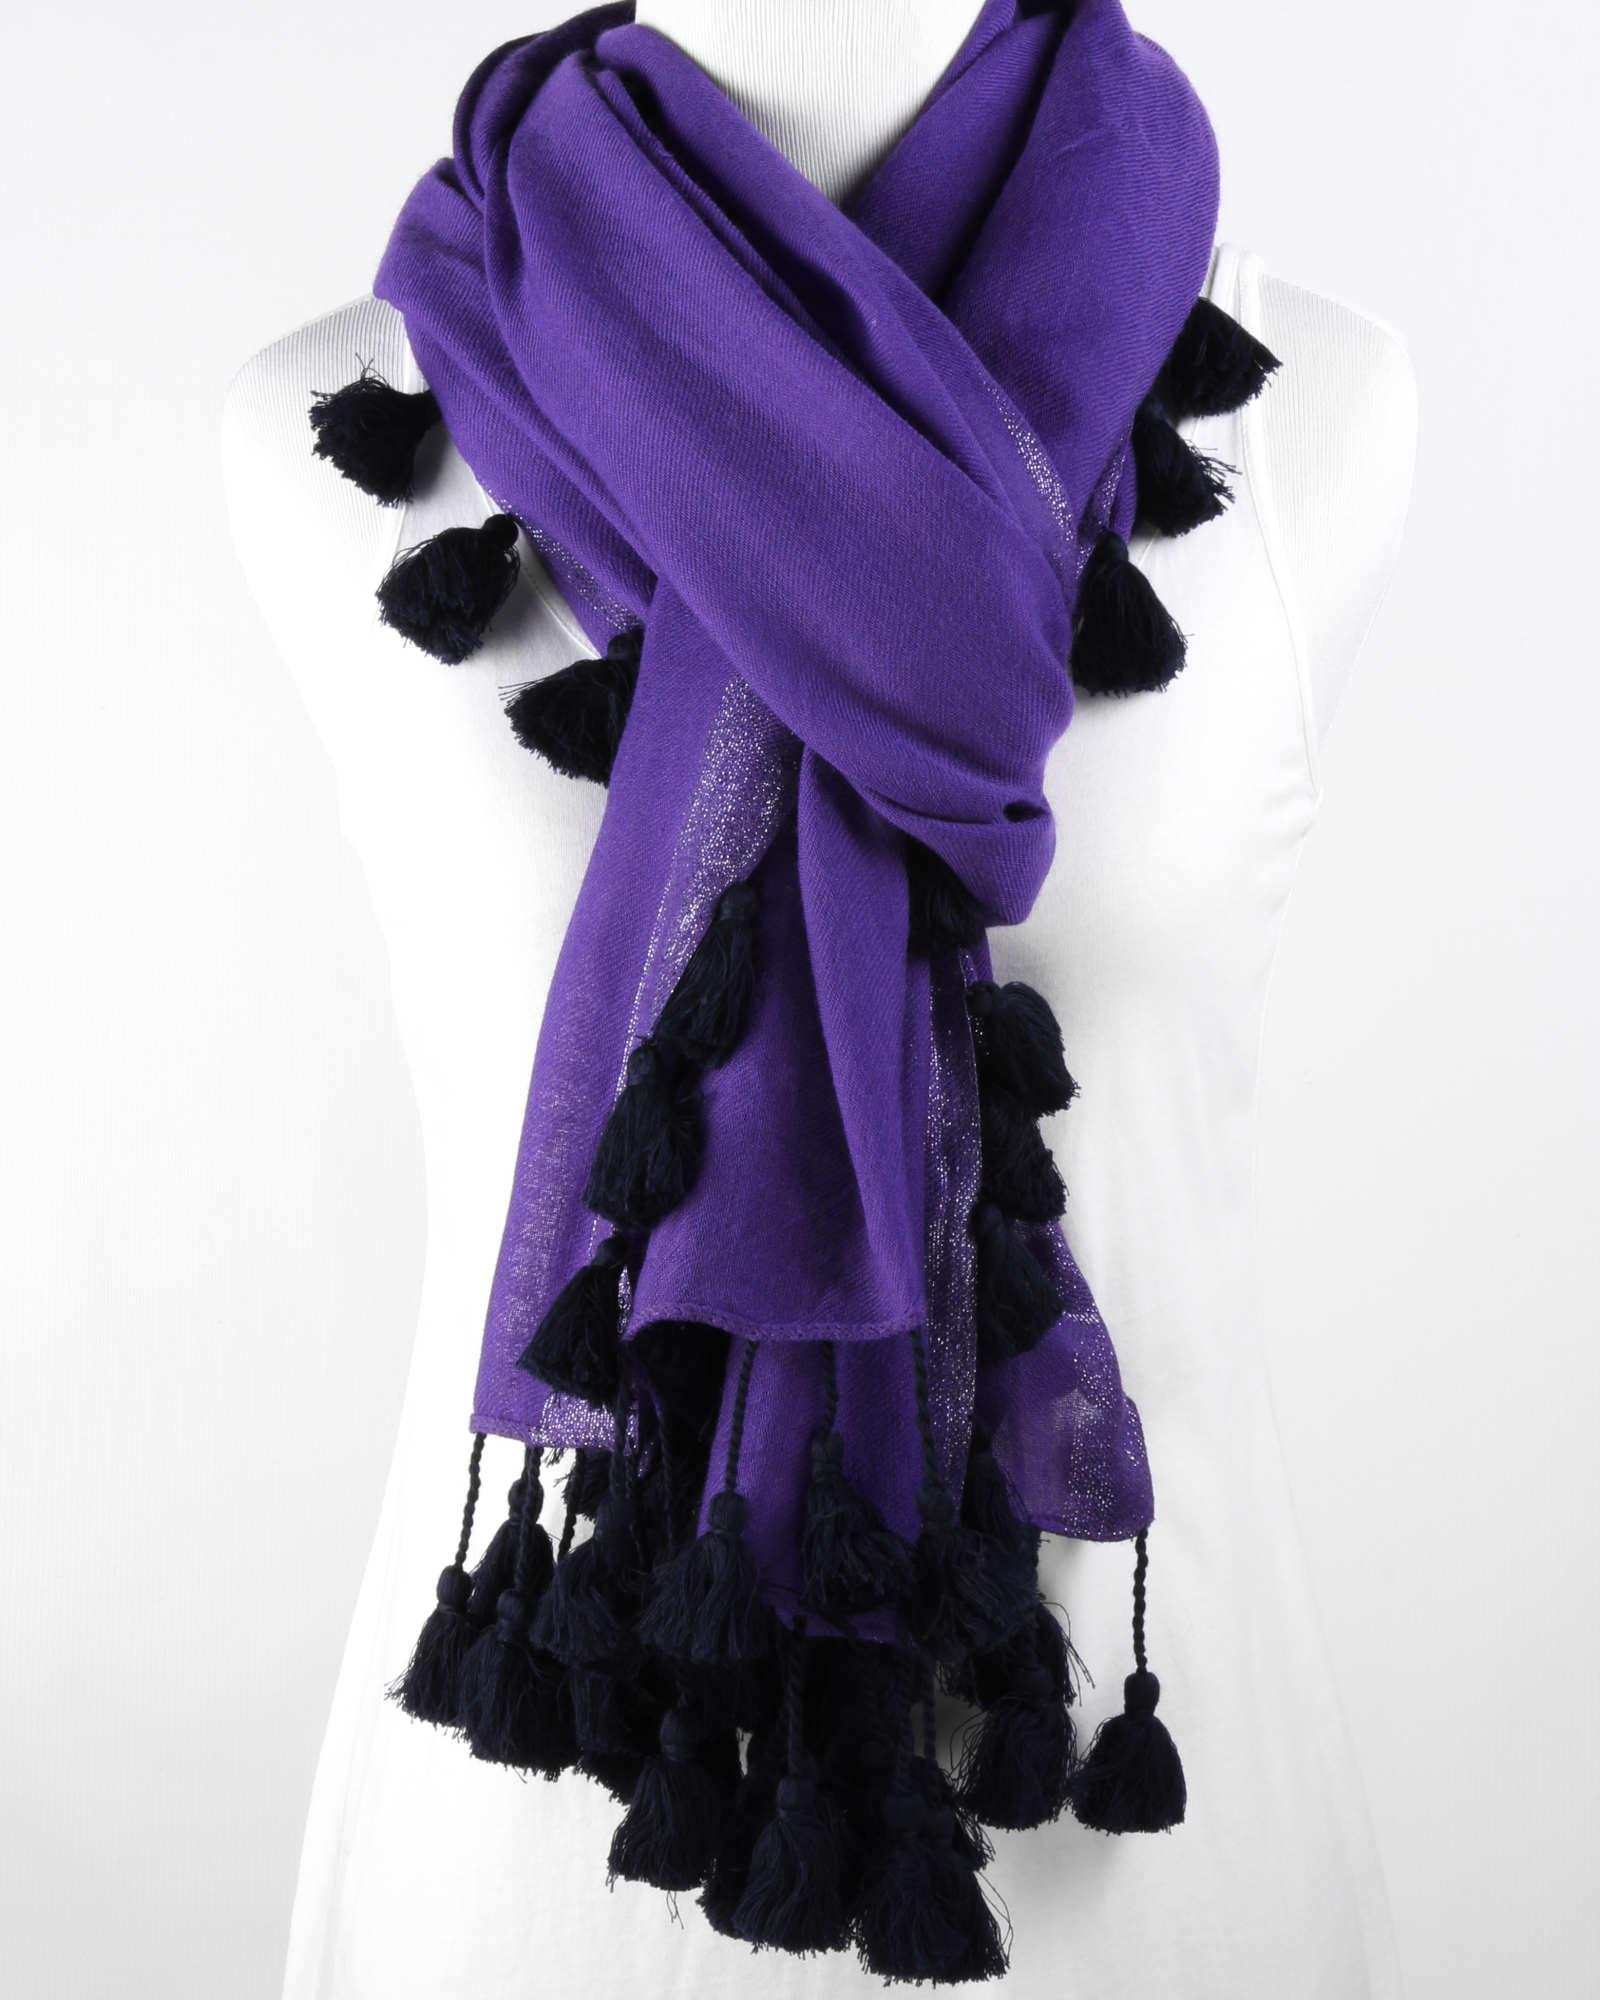 Tassled Shimmer Wool Scarf